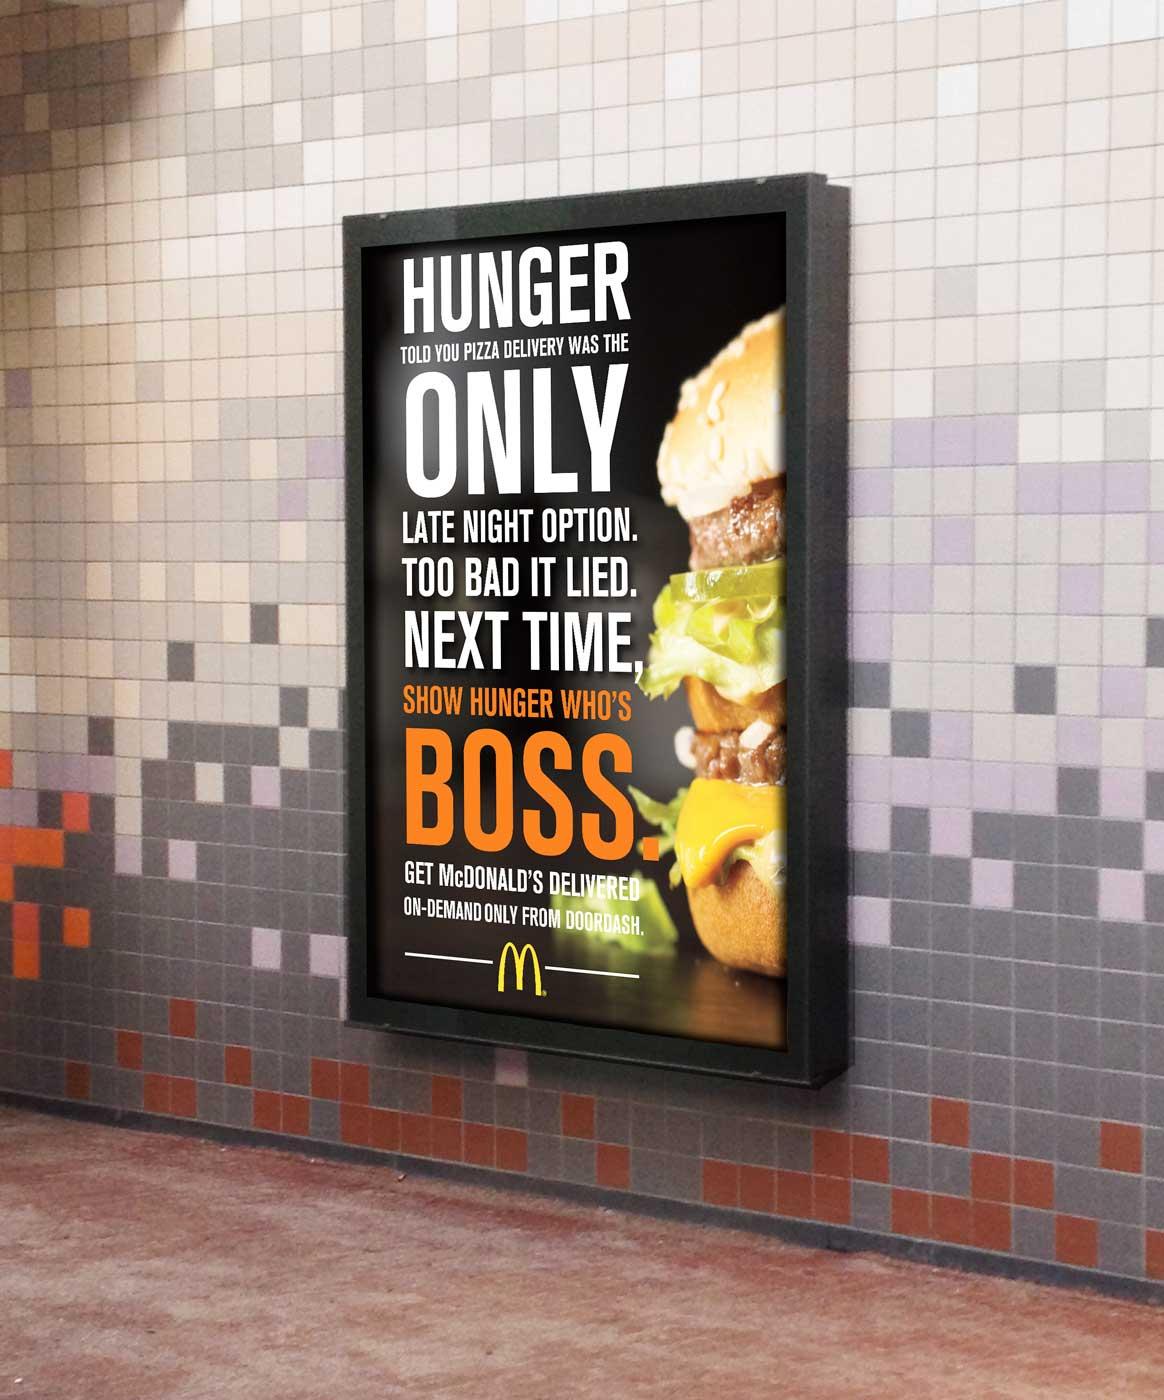 Subway station ad